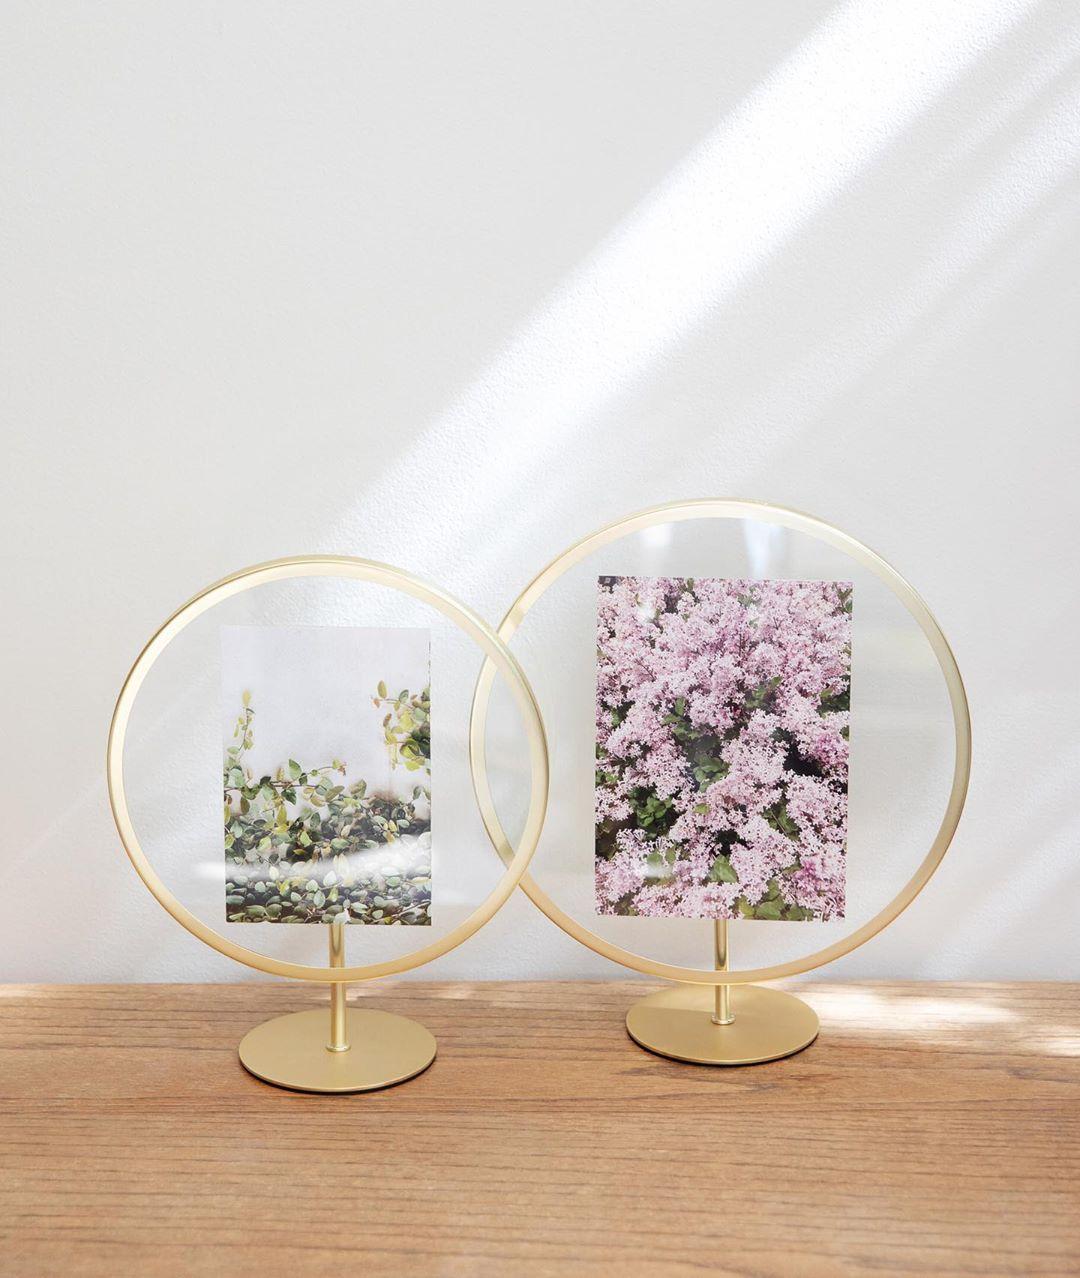 Infinity Photo Frame Display